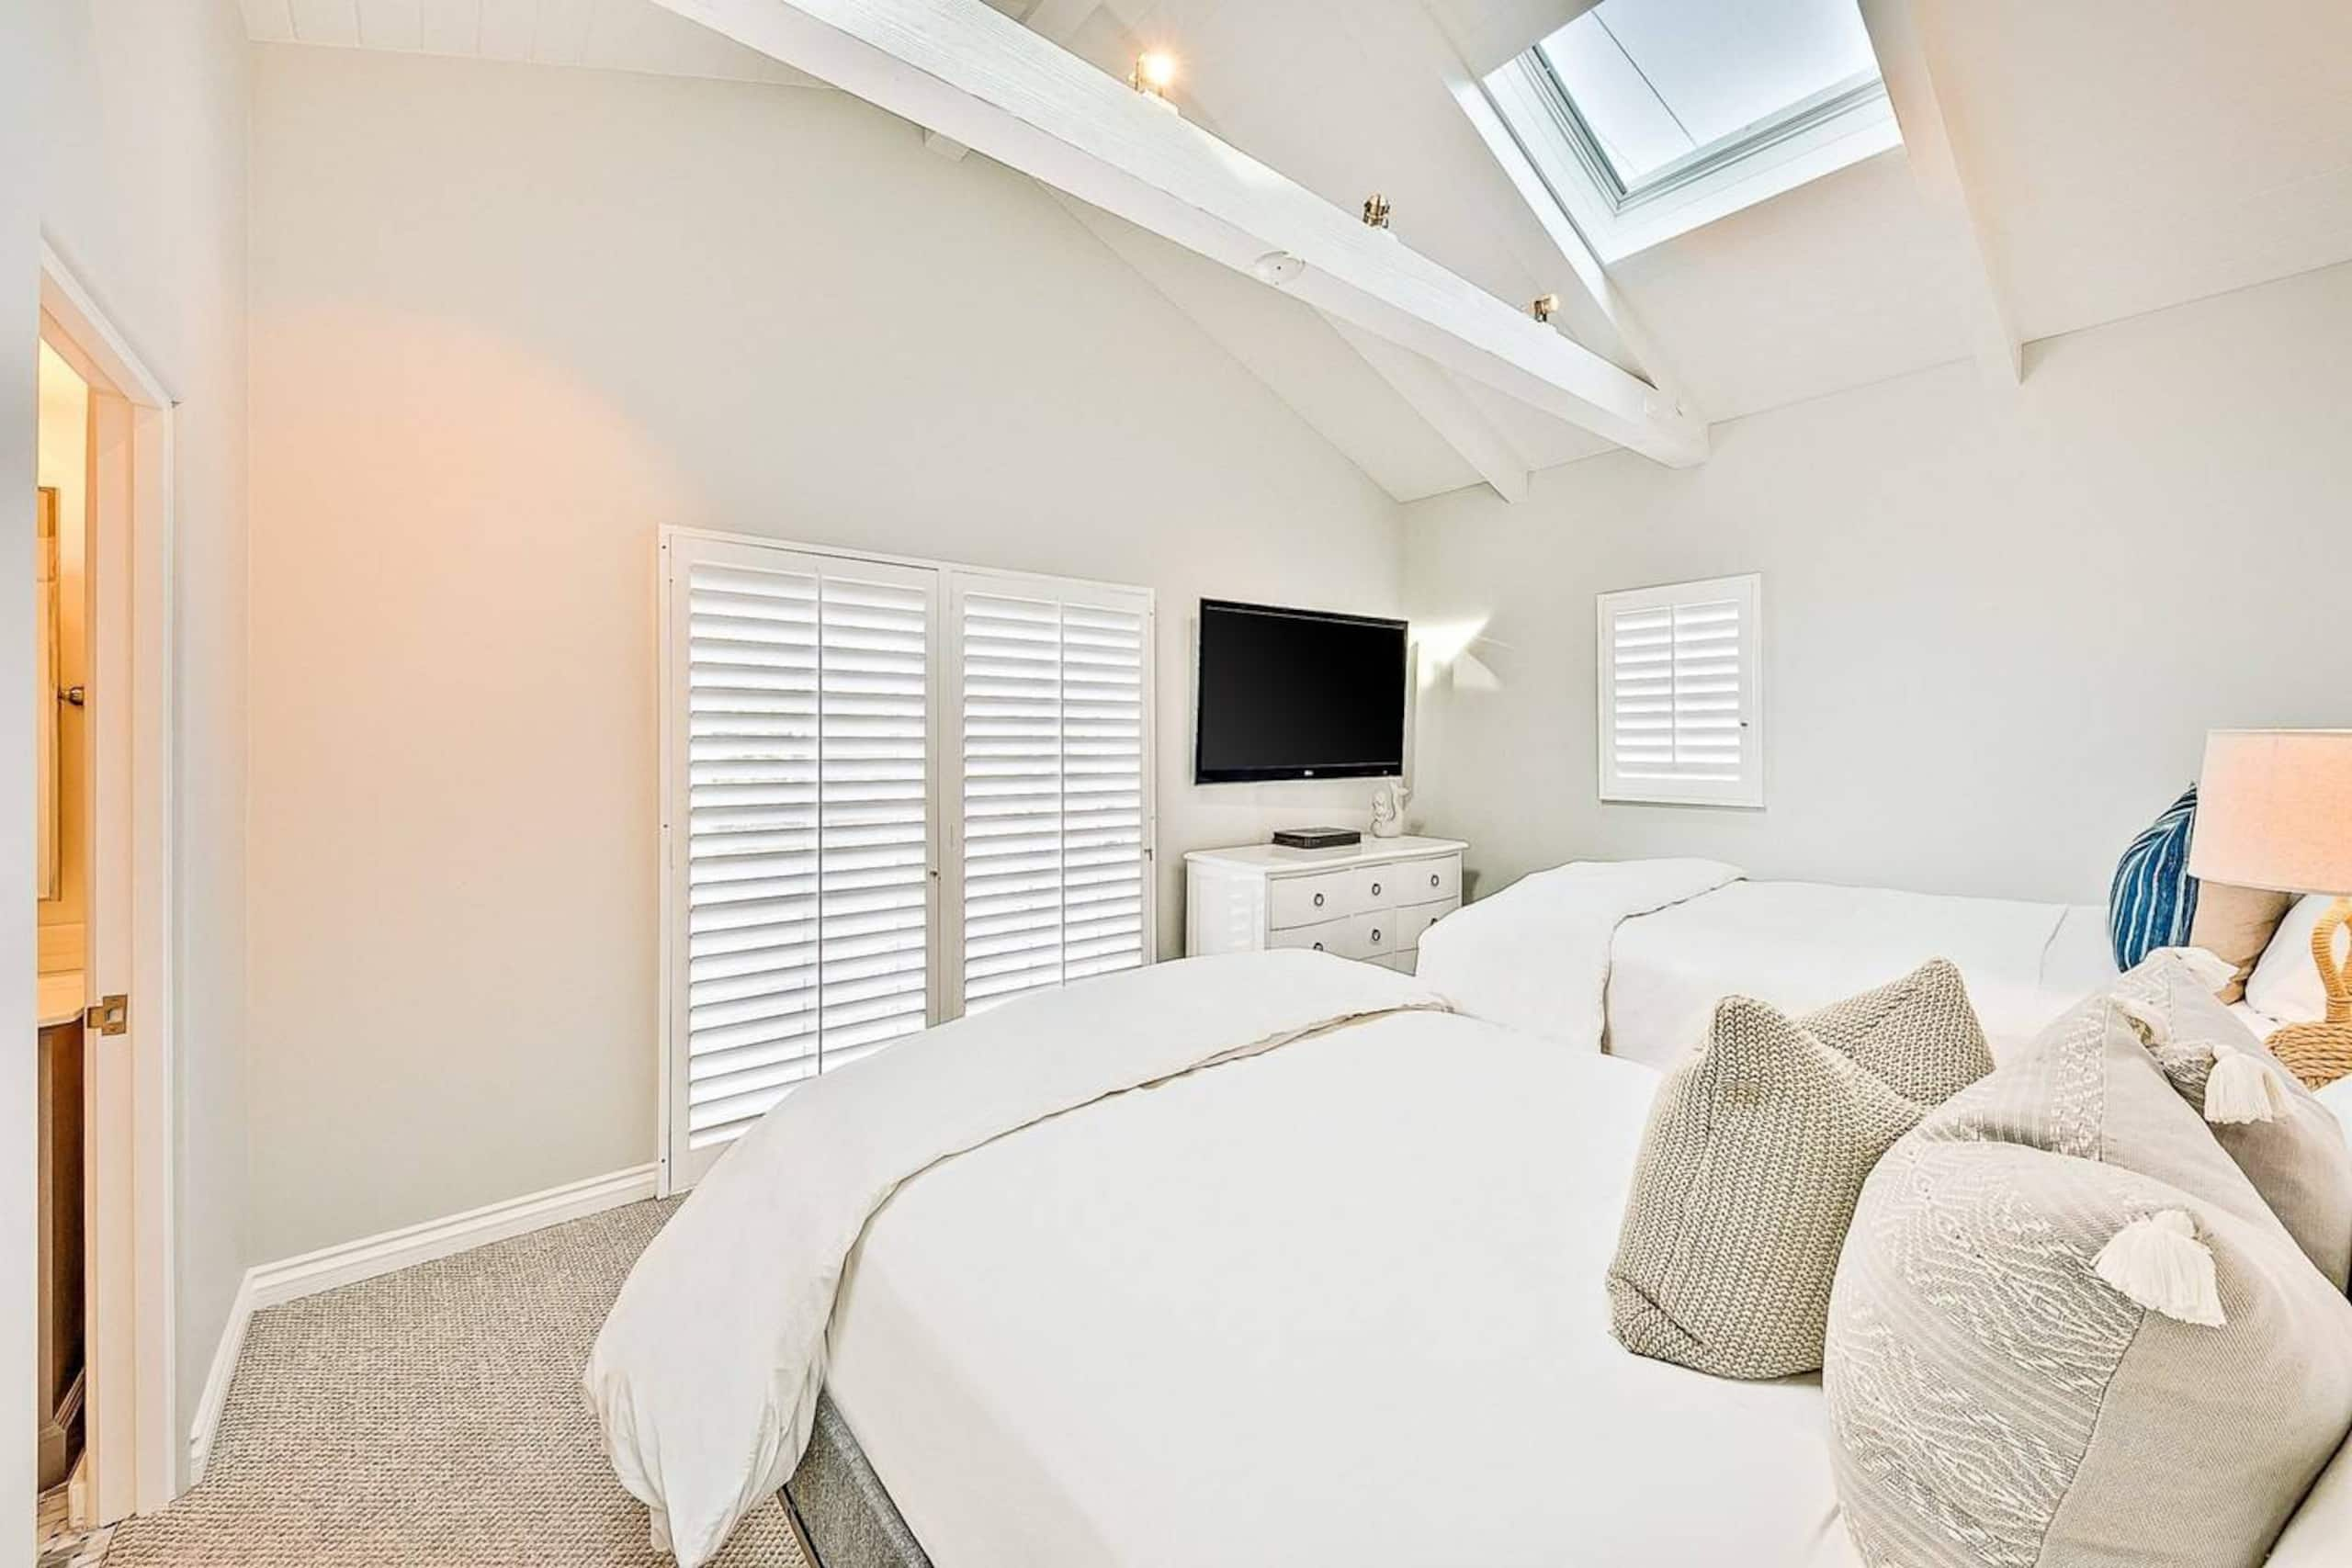 Apartment Villa Shawaiz - Beachfront Villa with 5 beds  photo 20356496